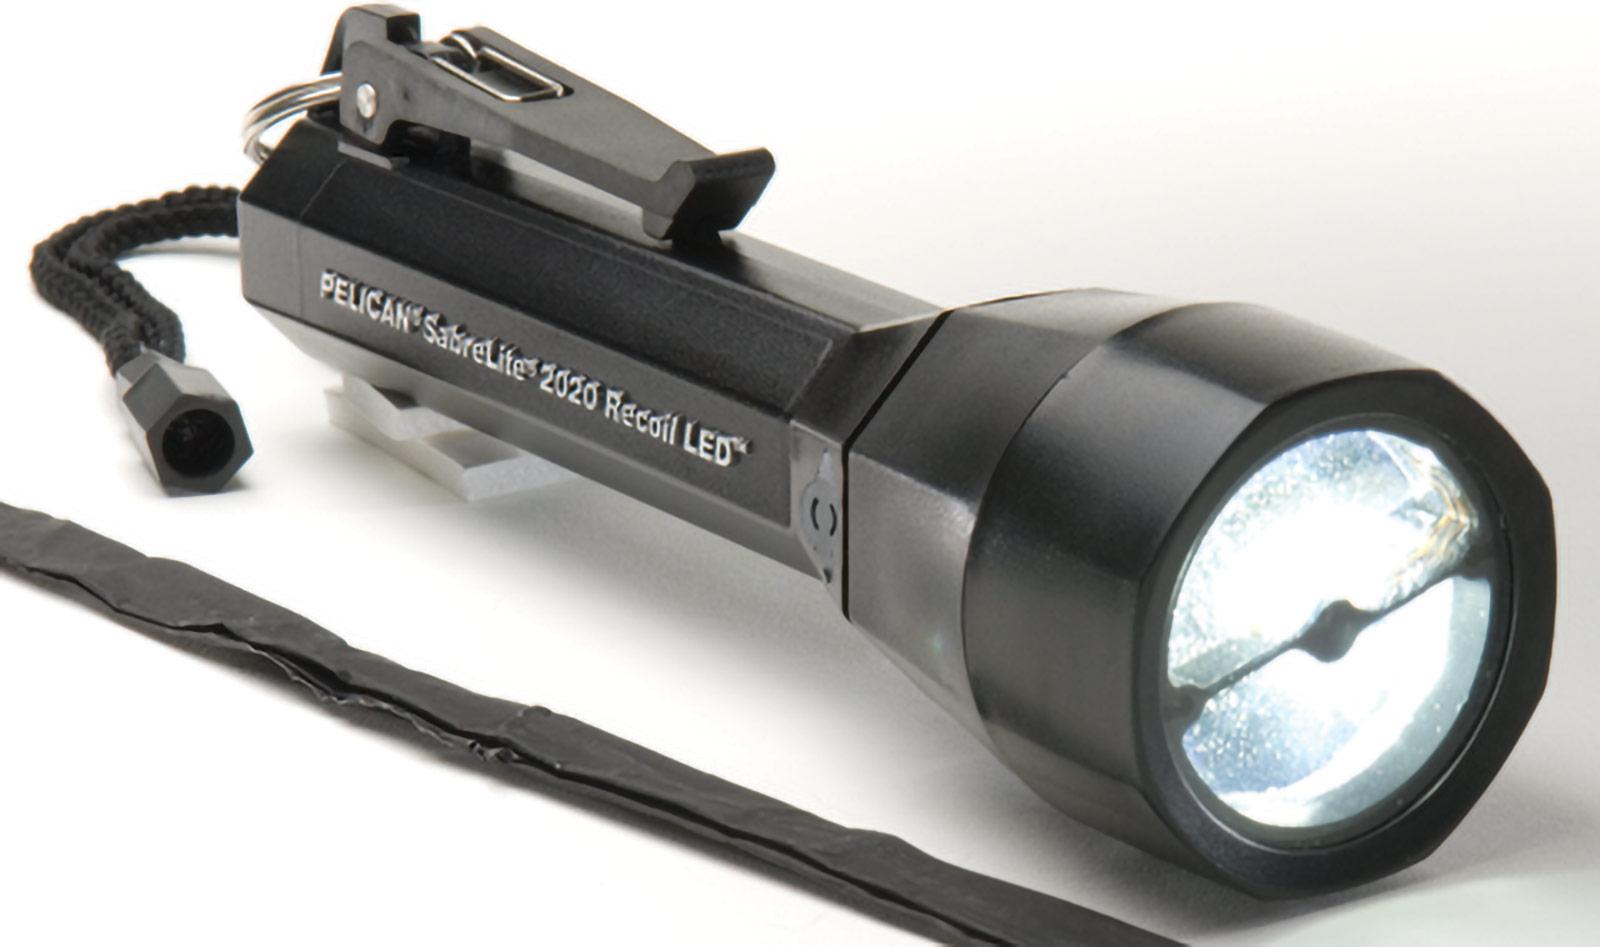 pelican 2020 regulated recoil led flashlight